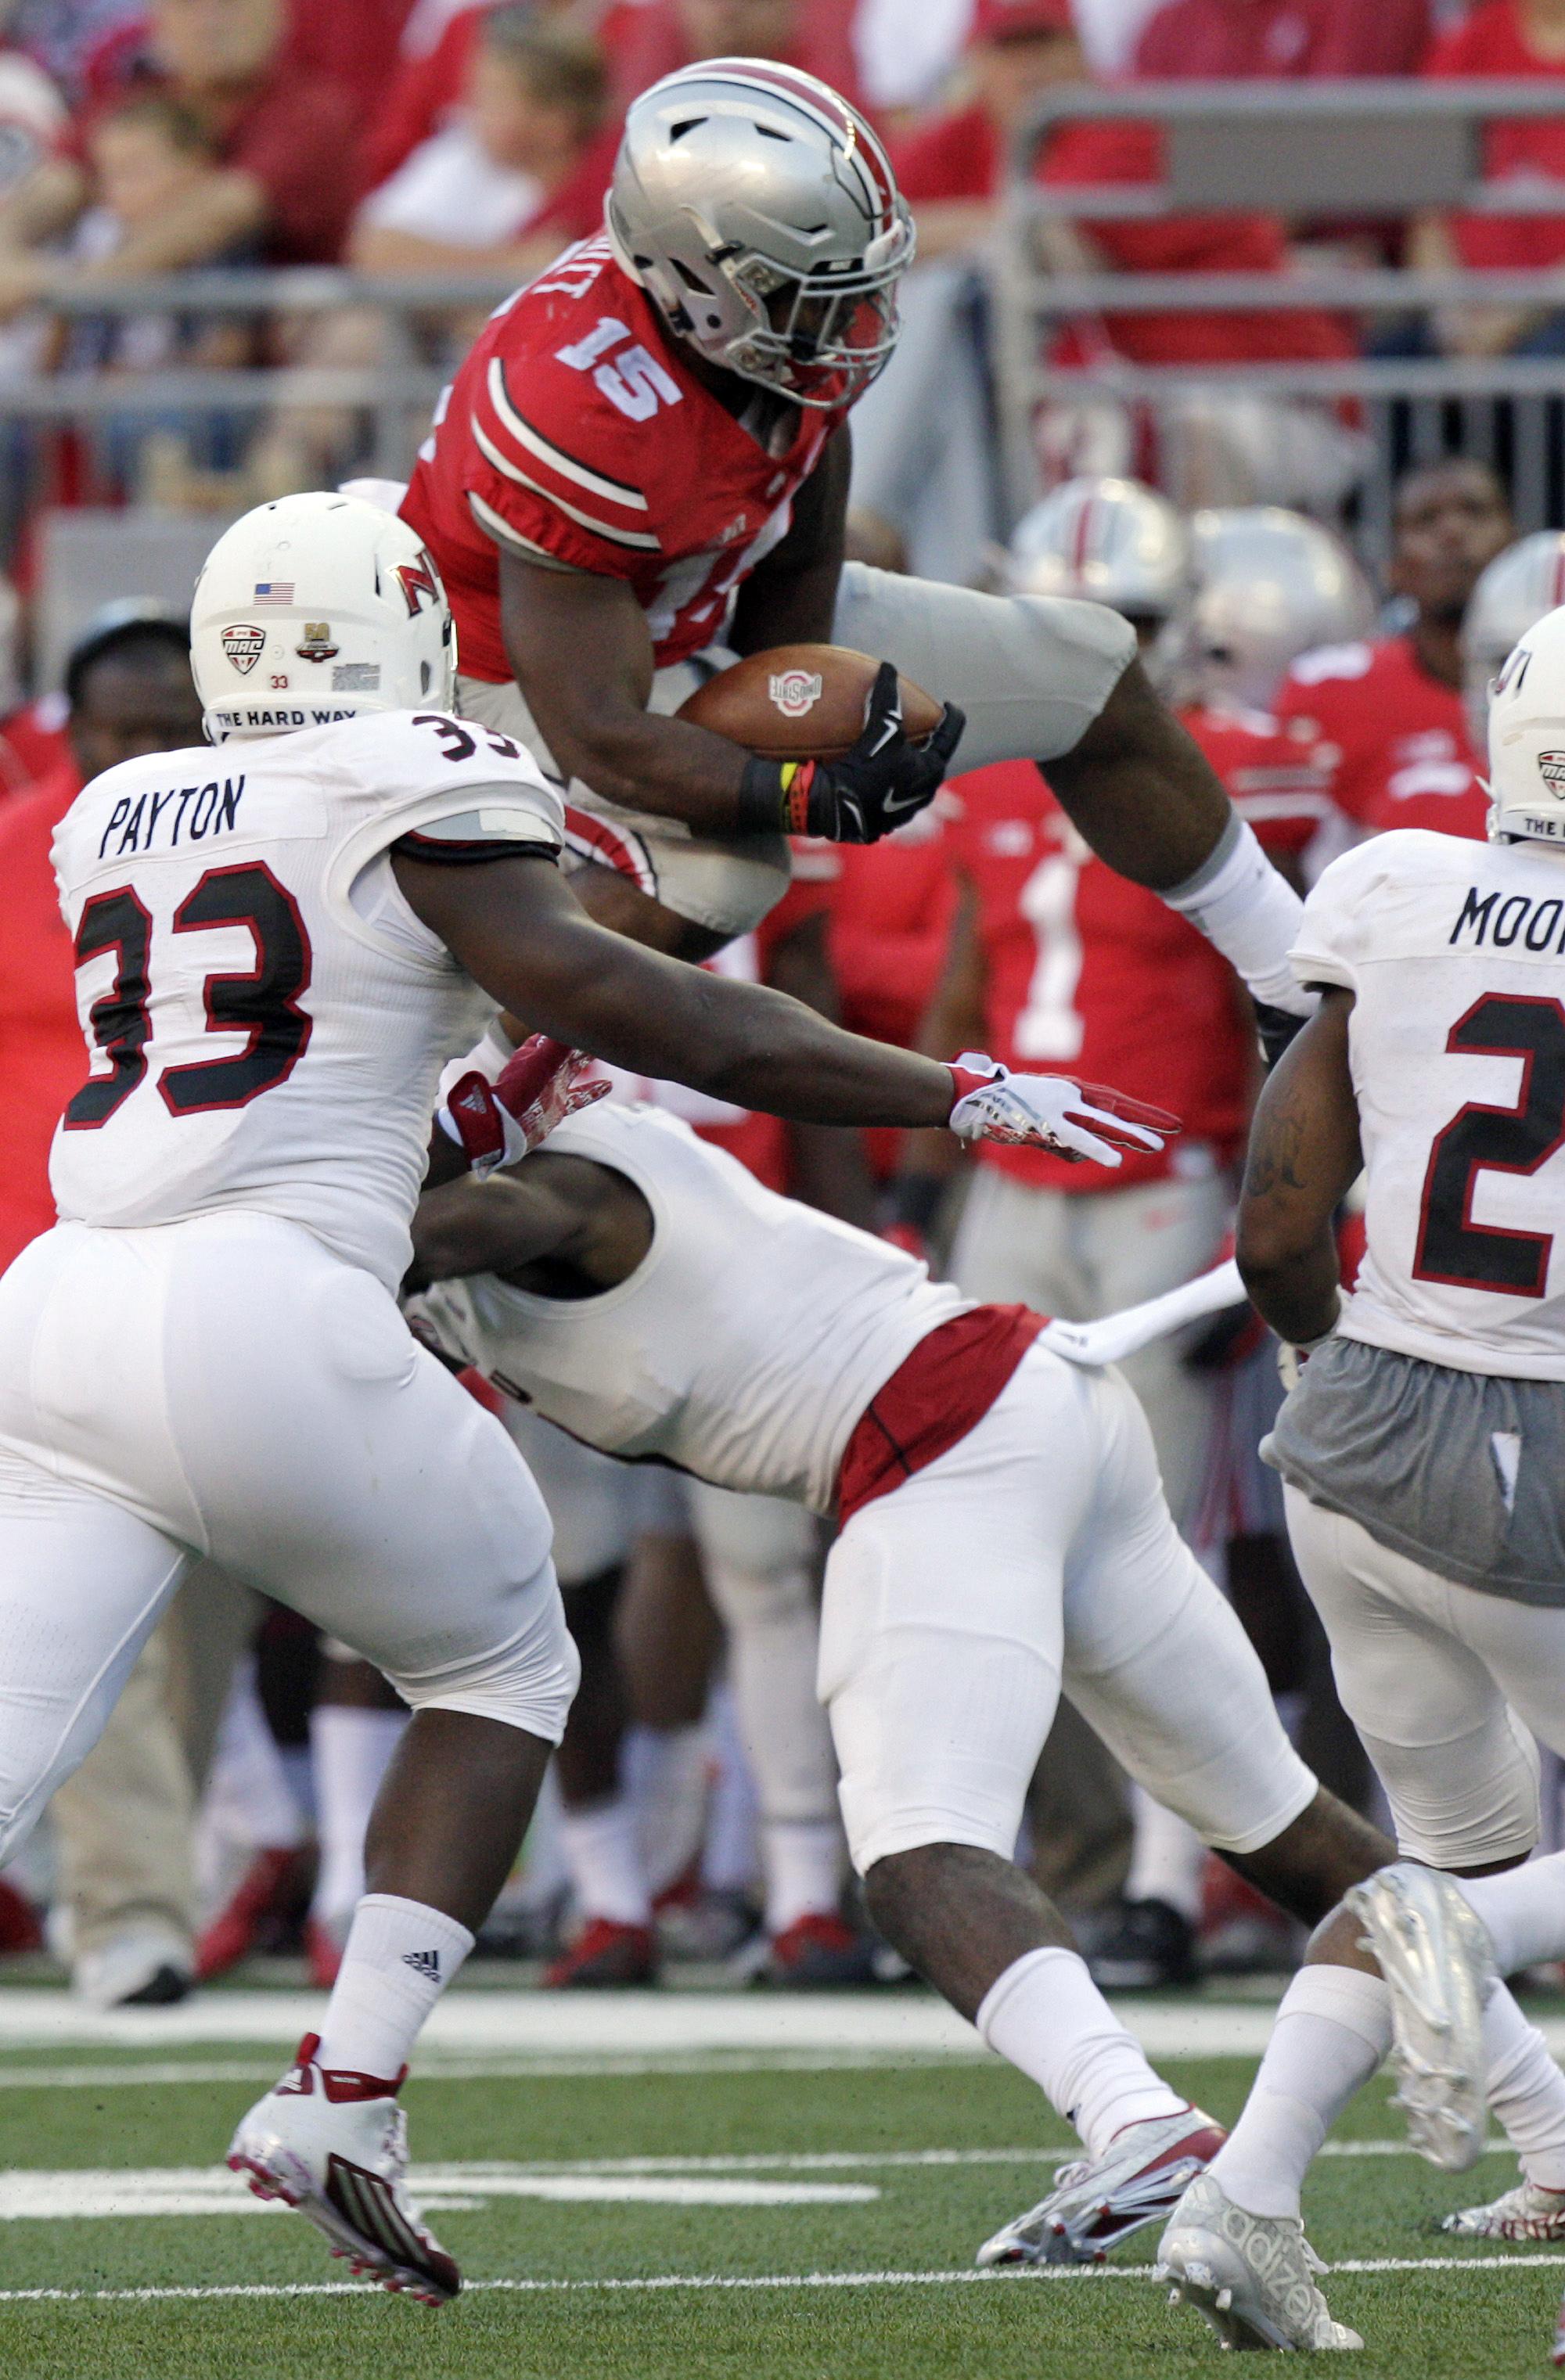 Ohio State running back Ezekiel Elliott, top, leaps over Northern Illinois cornerback Albert Smalls during the third quarter of an NCAA college football game Saturday, Sept. 19, 2015, in Columbus, Ohio. Ohio State won 20-13. (AP Photo/Jay LaPrete)